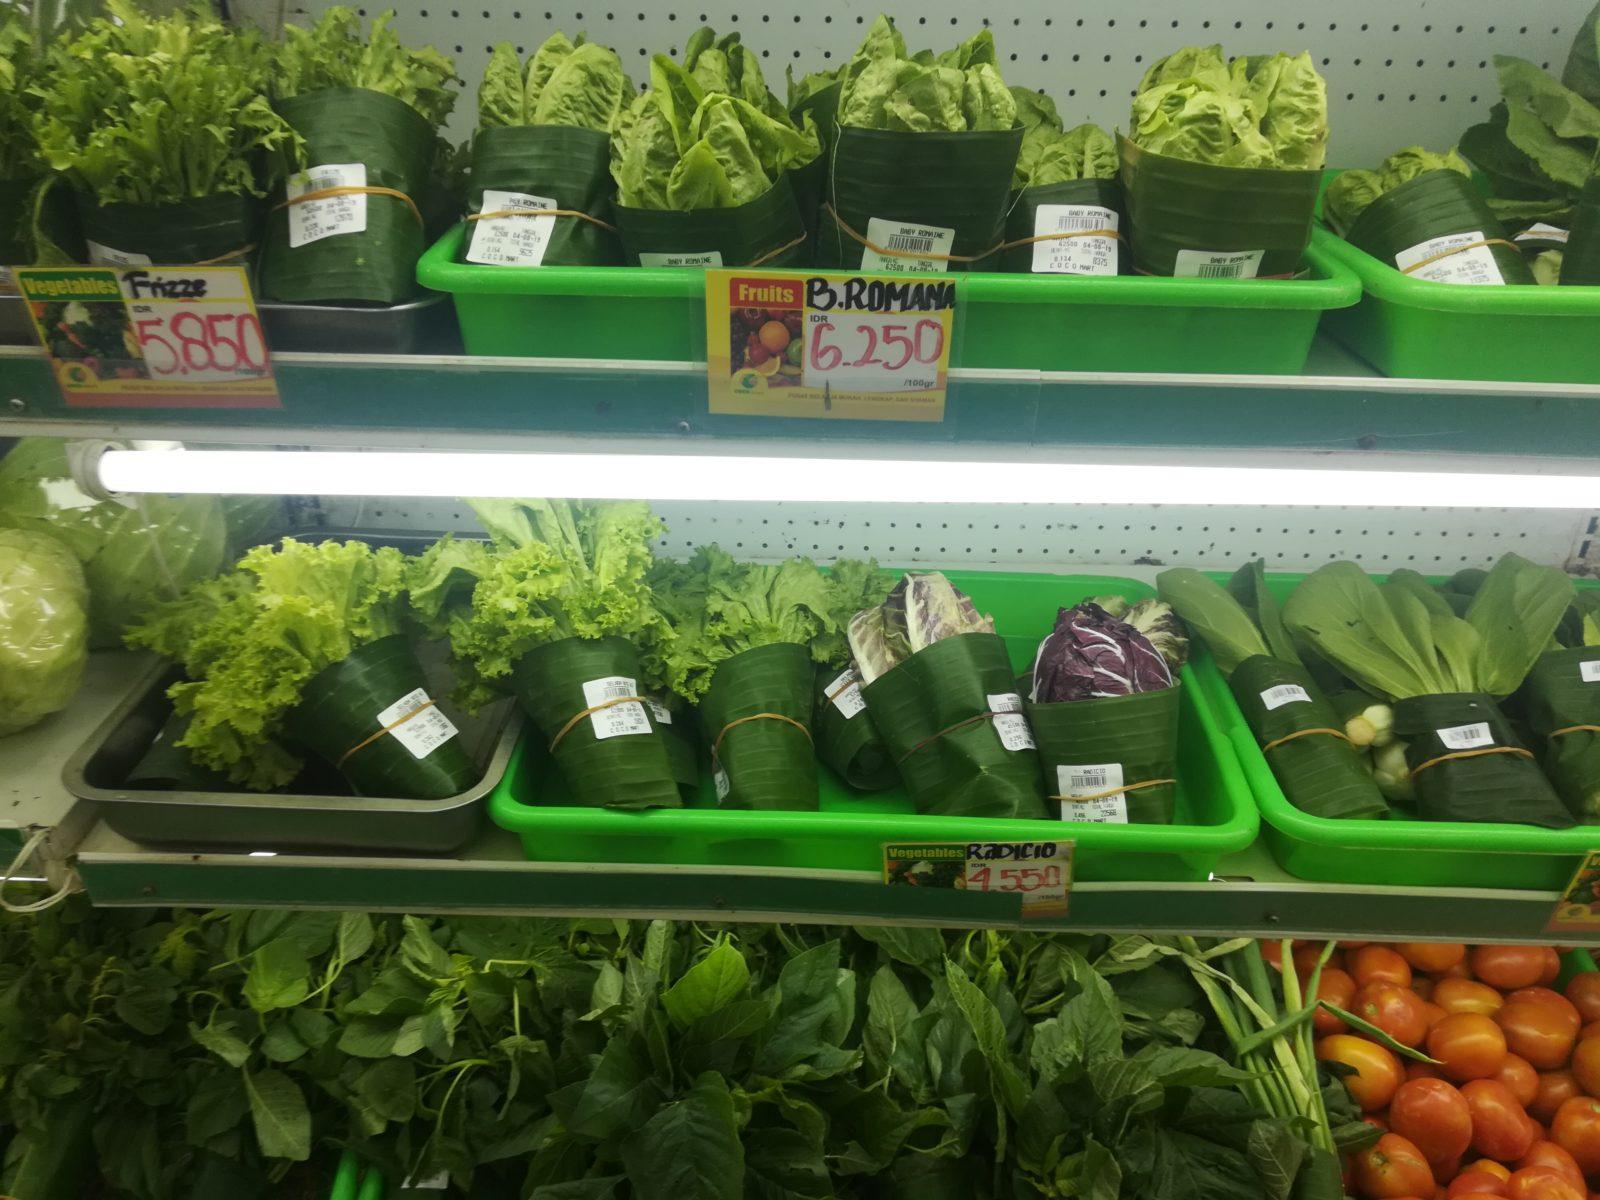 Supermärkte steigen bereits auf Bananenblätter als Verpackungsmaterial um © Svenja Hübinger